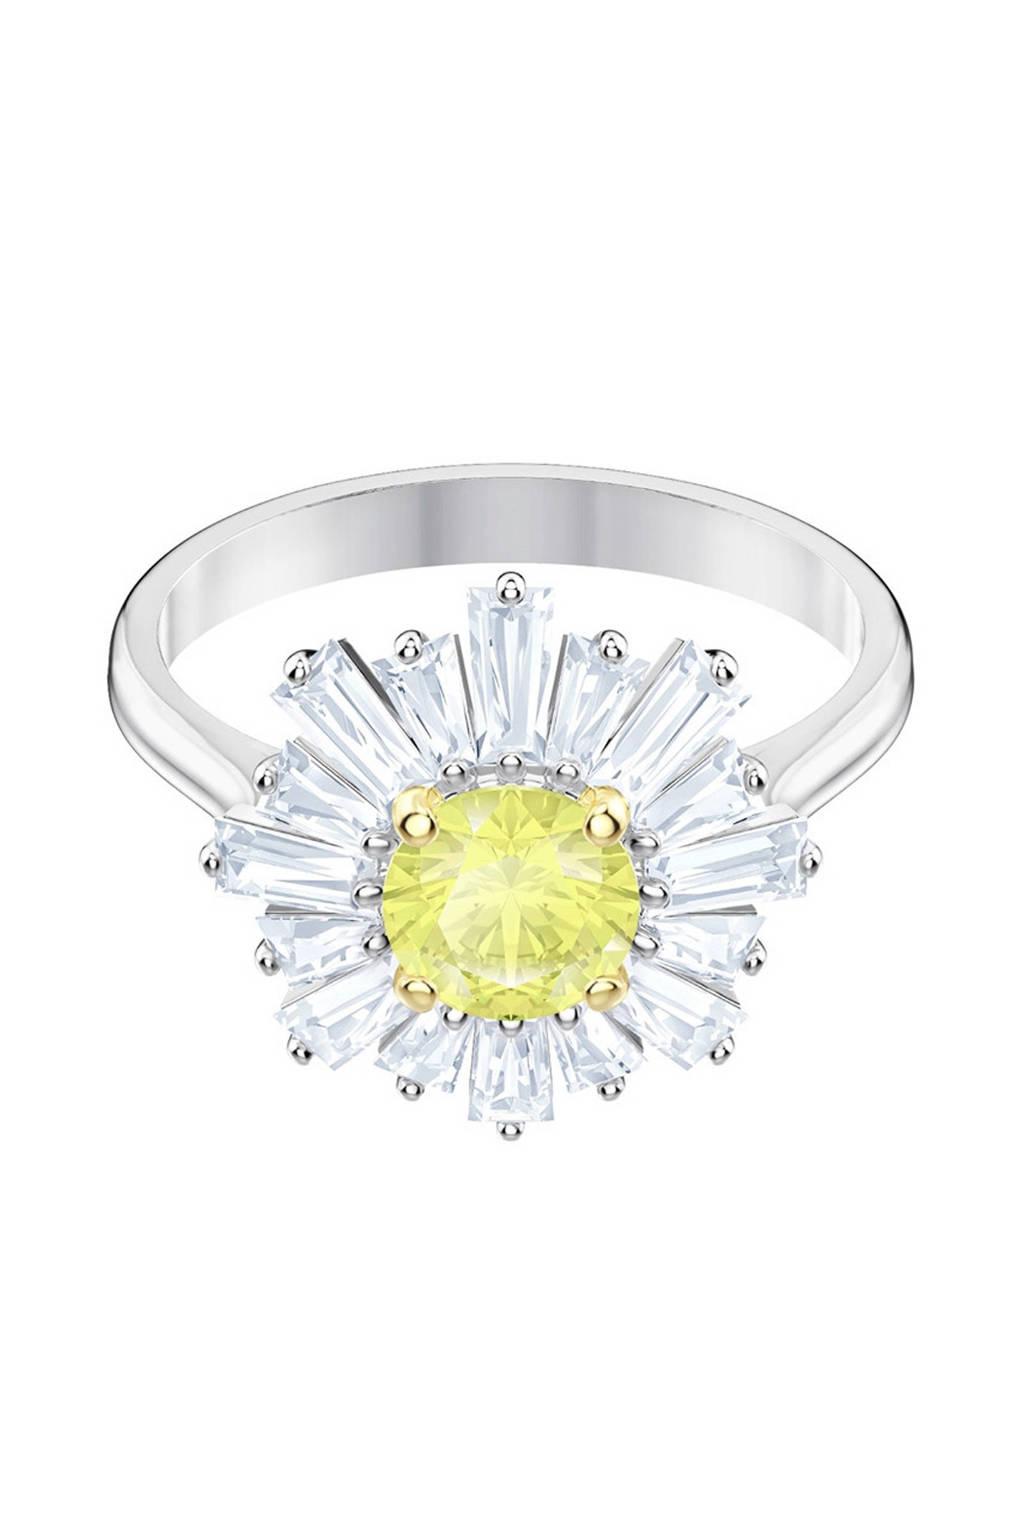 Swarovski ring Sunshine 5472481, Zilverkleurig